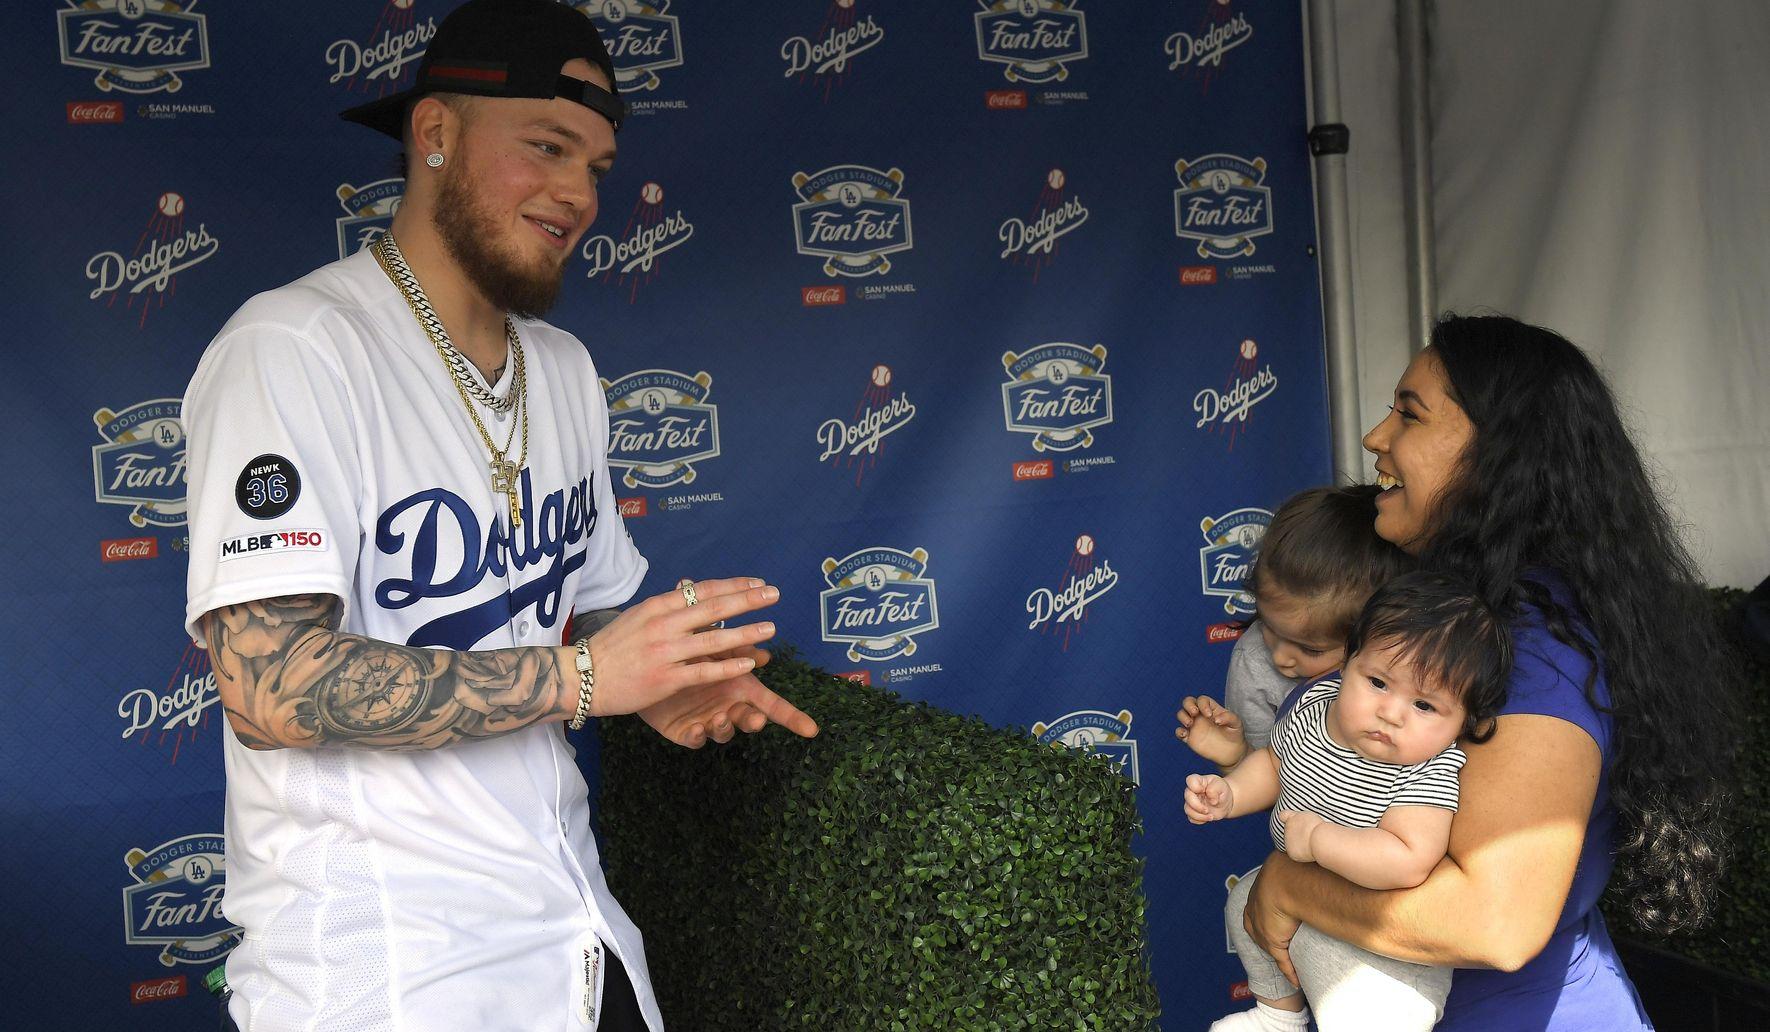 Dodgers_sign_stealing_baseball_10585_c0-200-4791-2993_s1770x1032